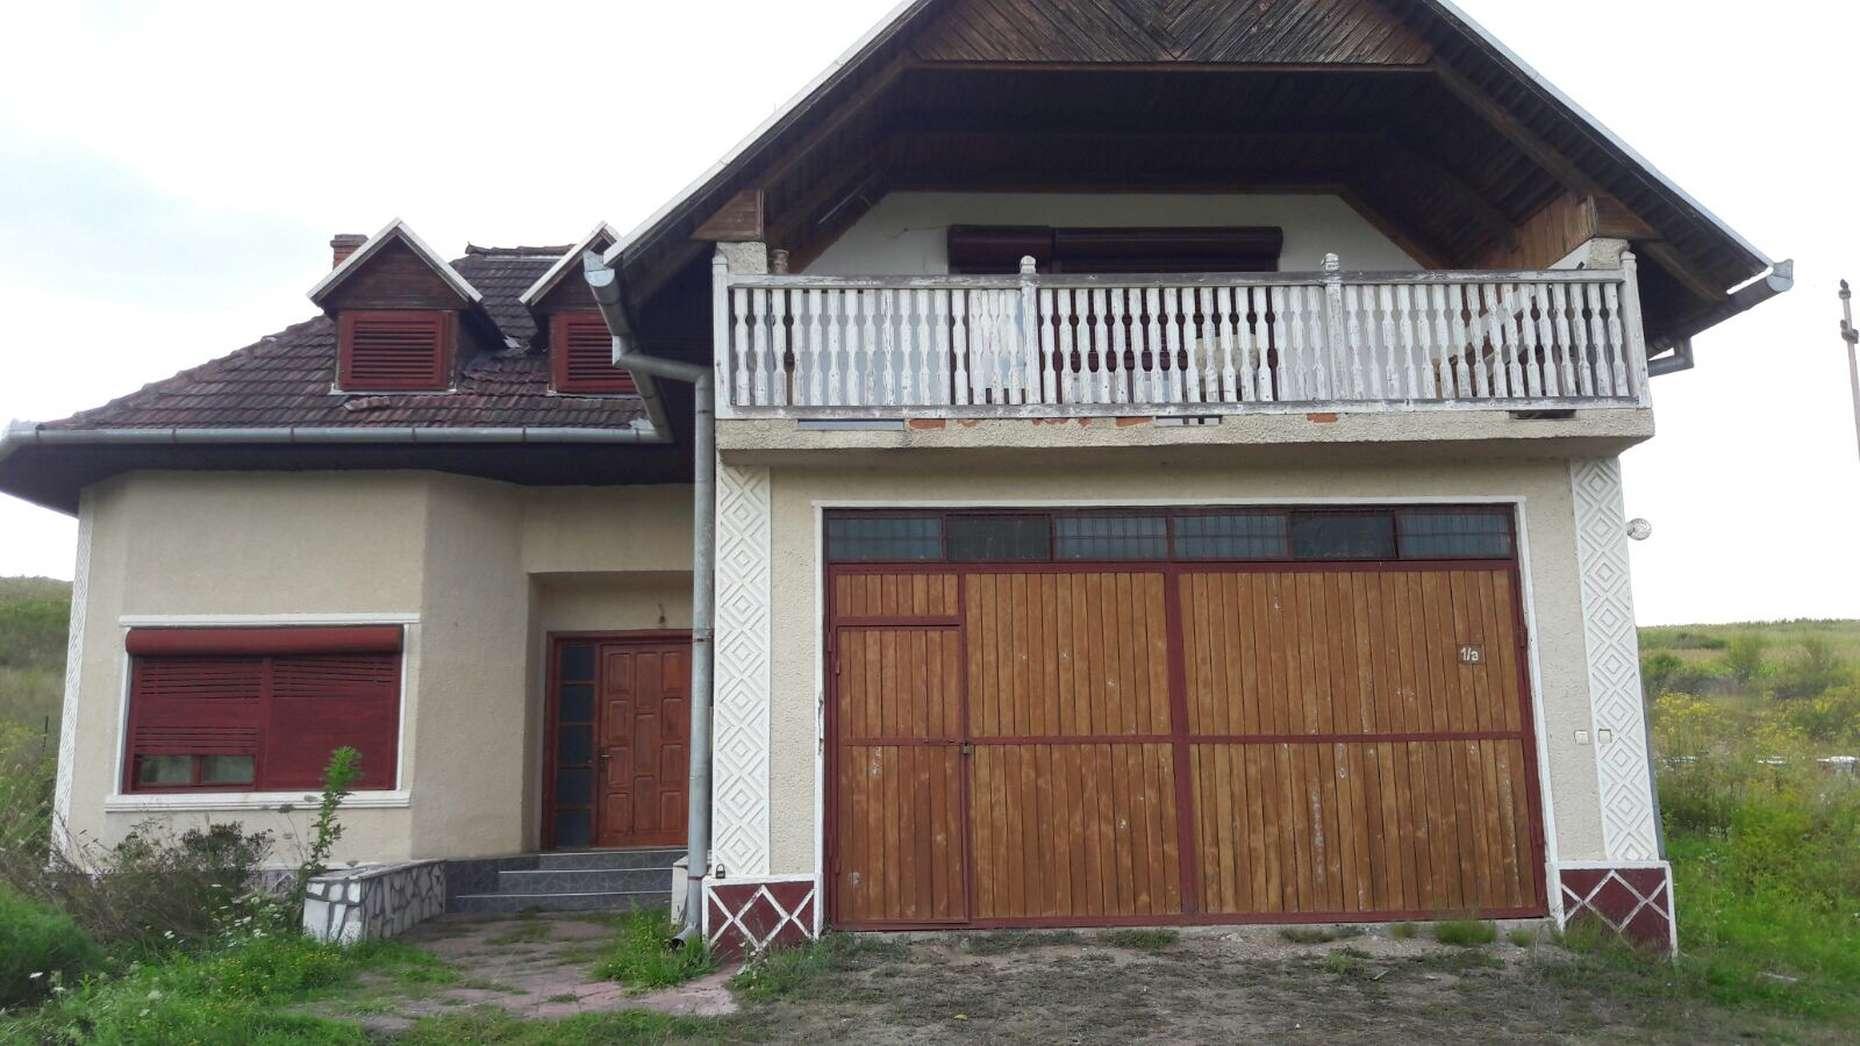 Casa 3 camere ardeal imobiliare site de anunturi - Terenes casa rural ...